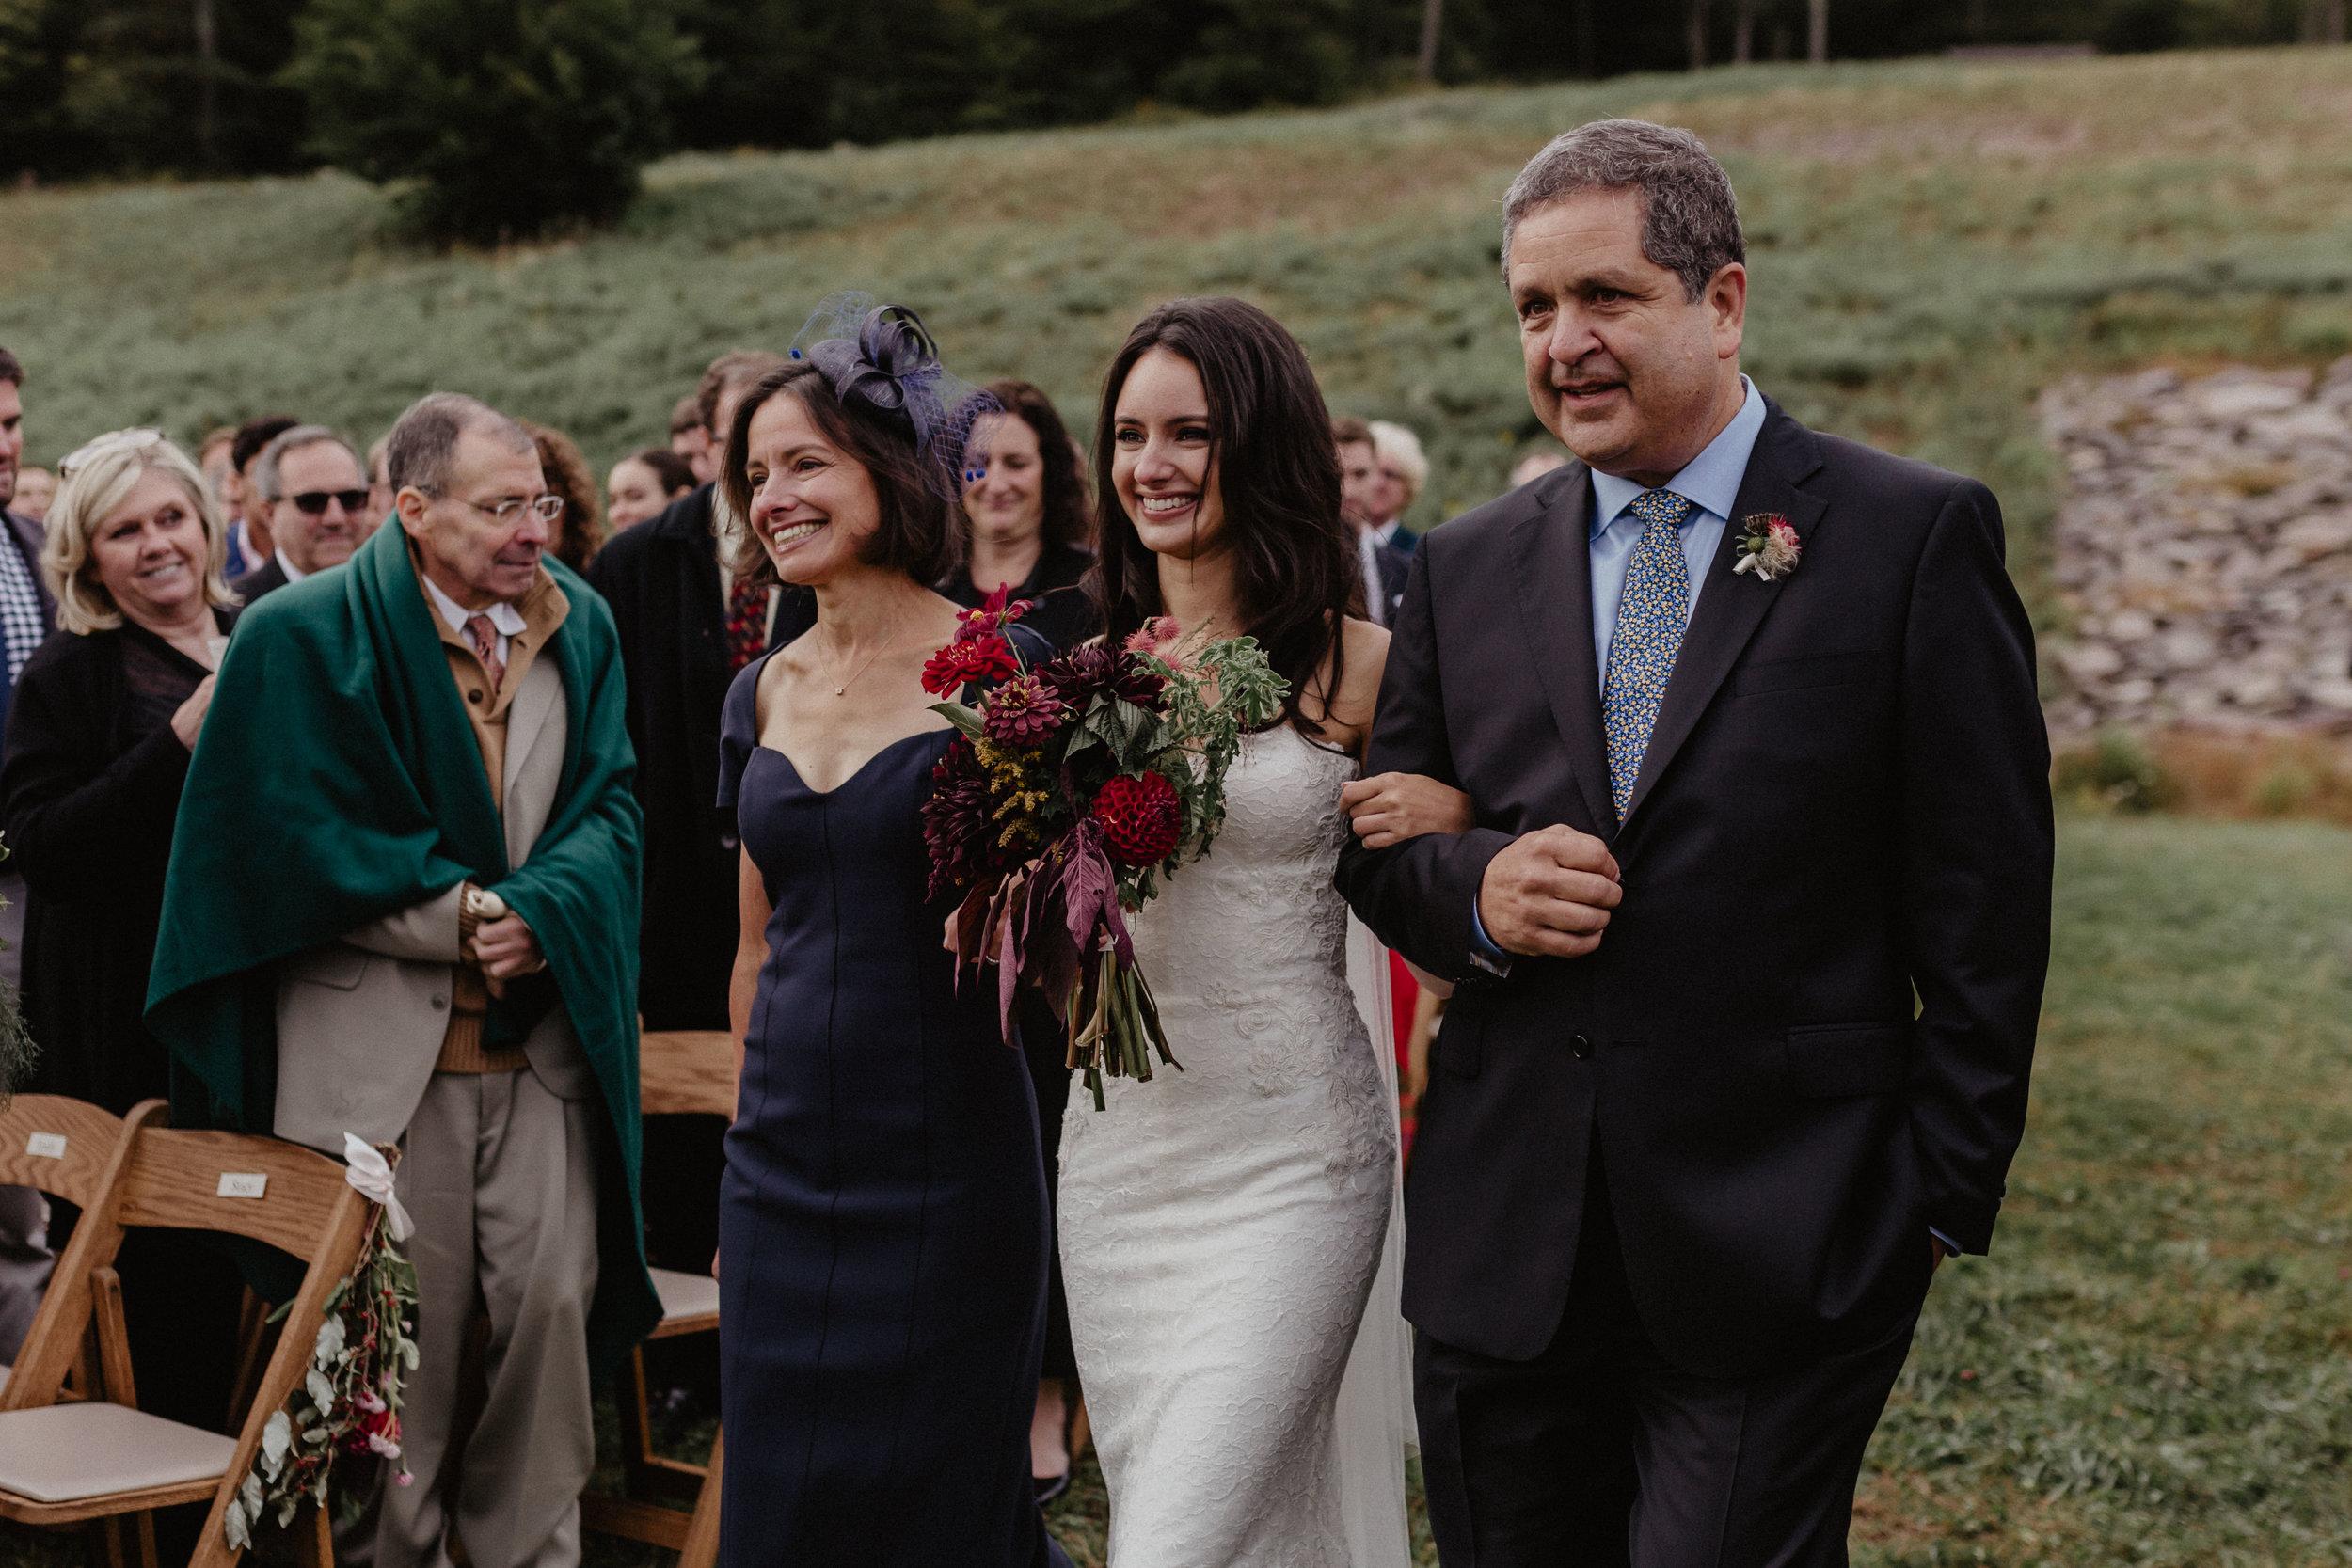 deer_mountain_inn_wedding_054.jpg